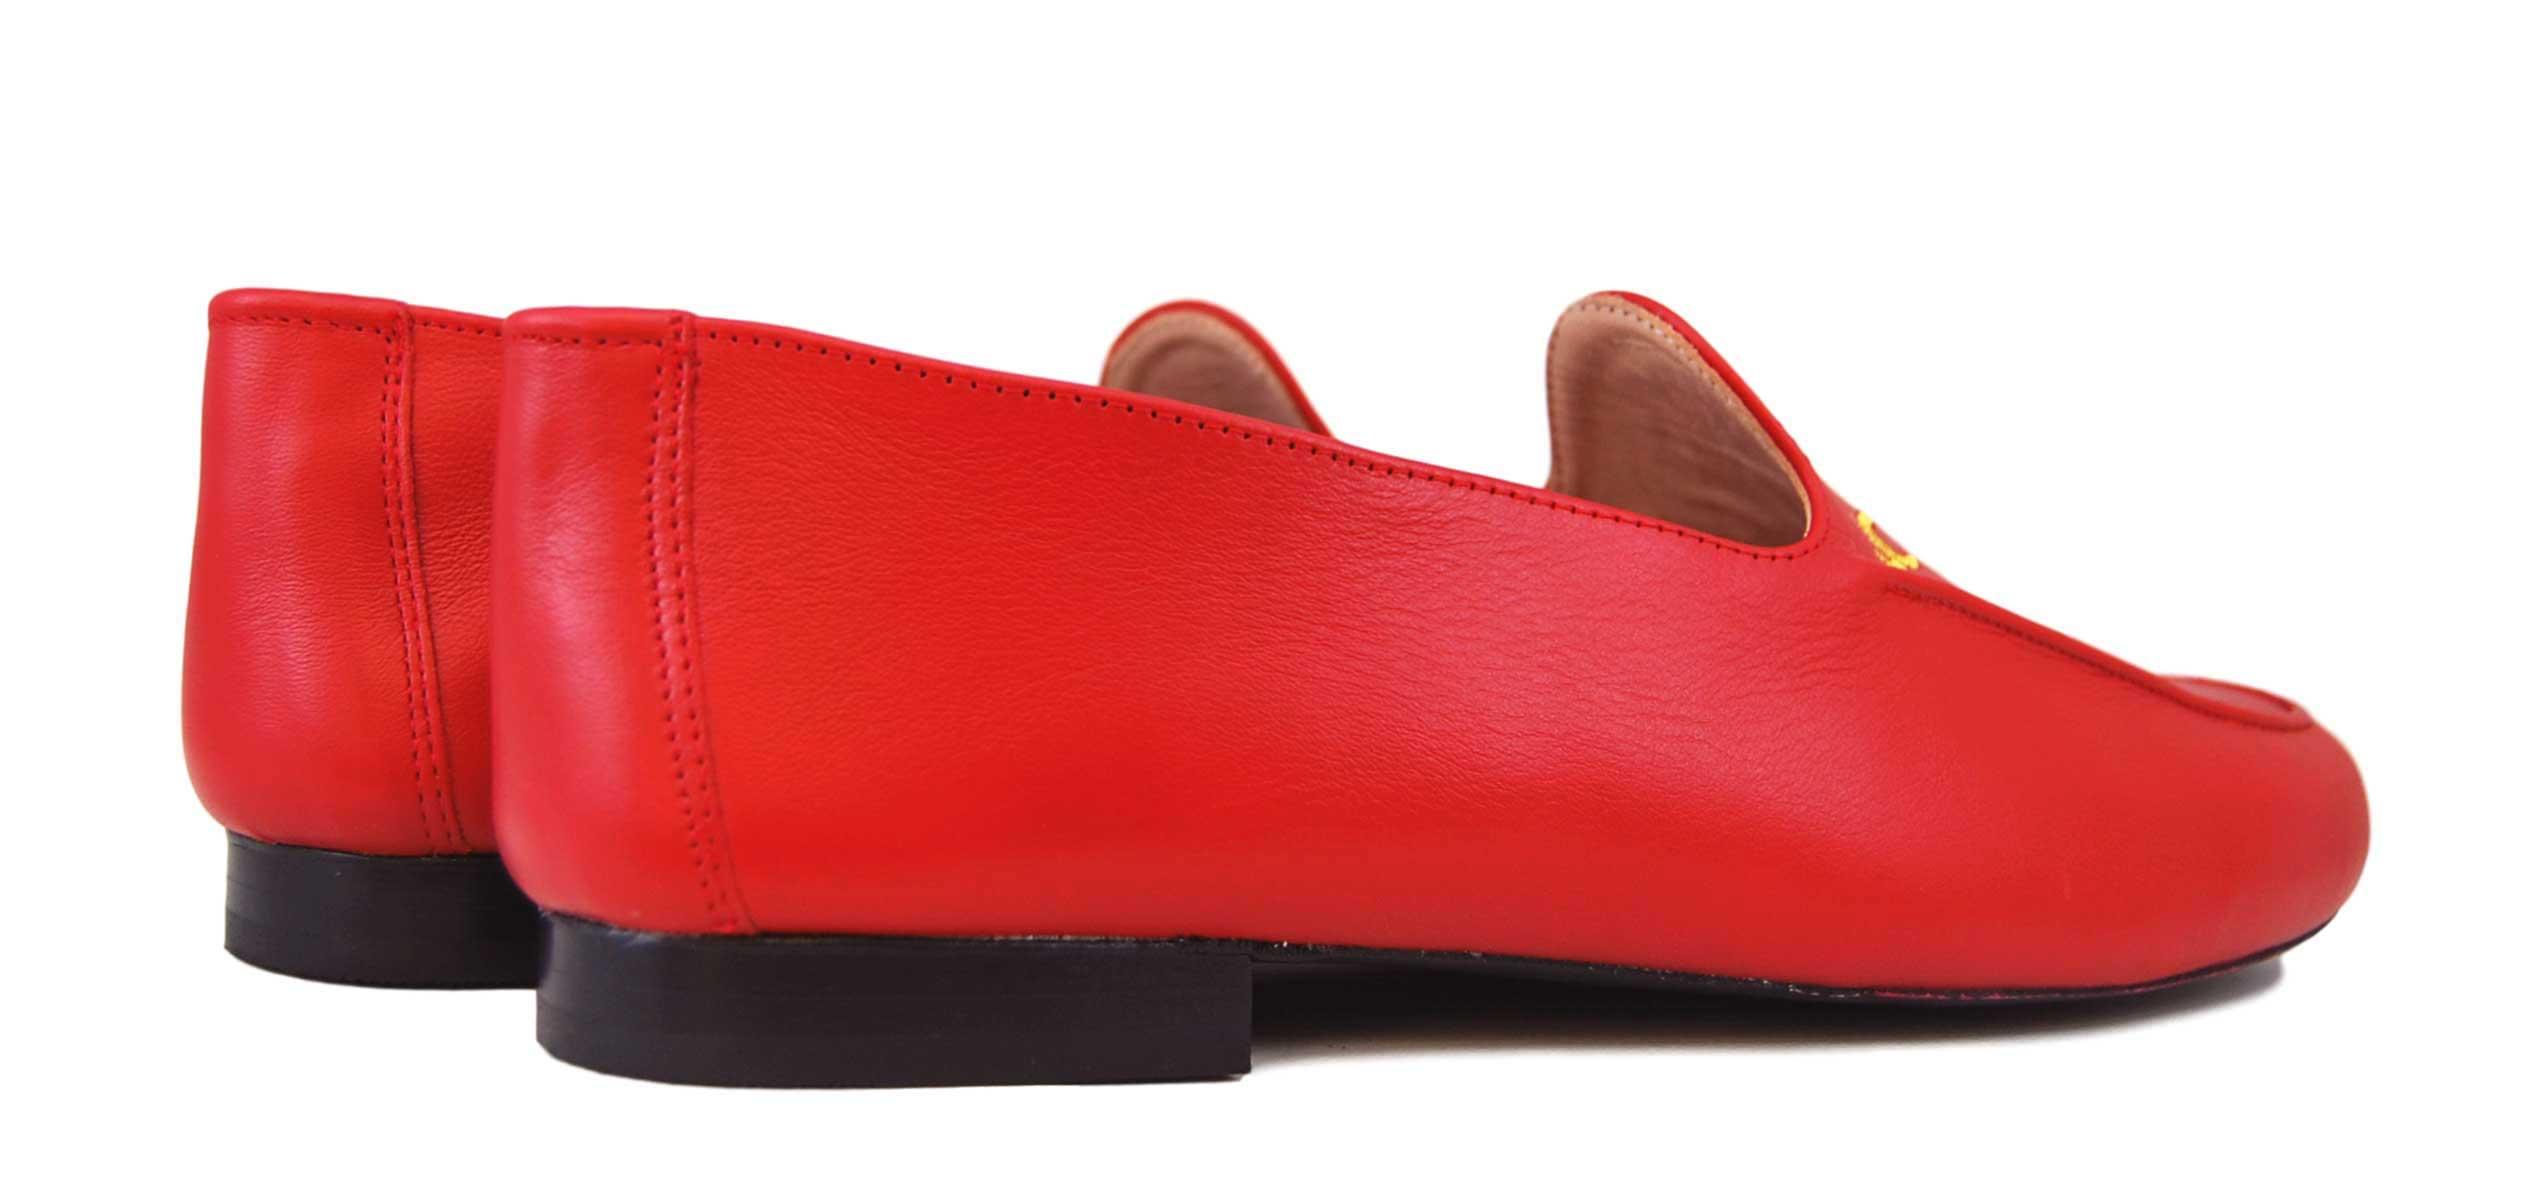 Foto 4 de Zapatos Julio Iglesias Mocasin 528 JC Rojo Napa